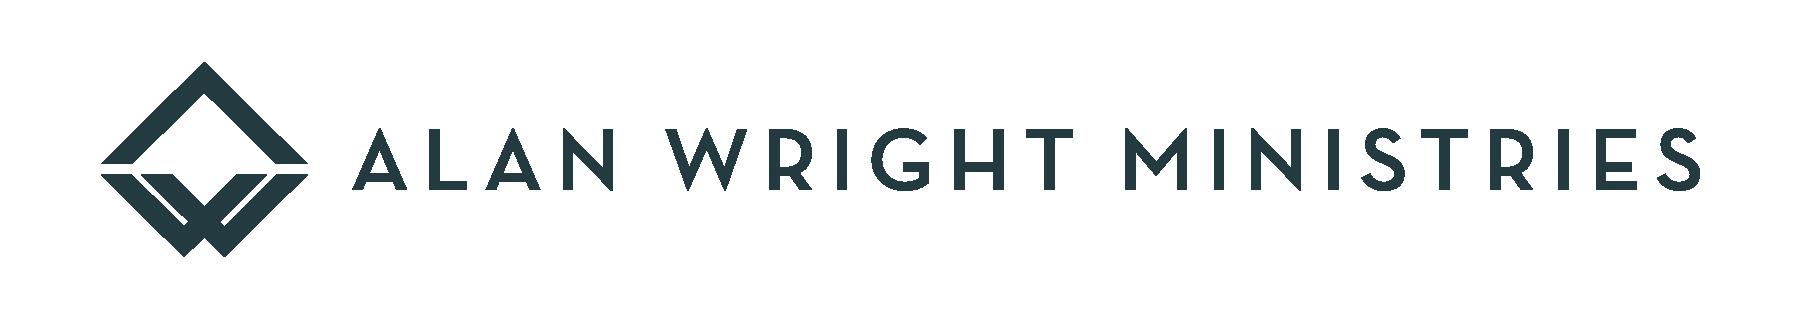 Alan Wright Ministries